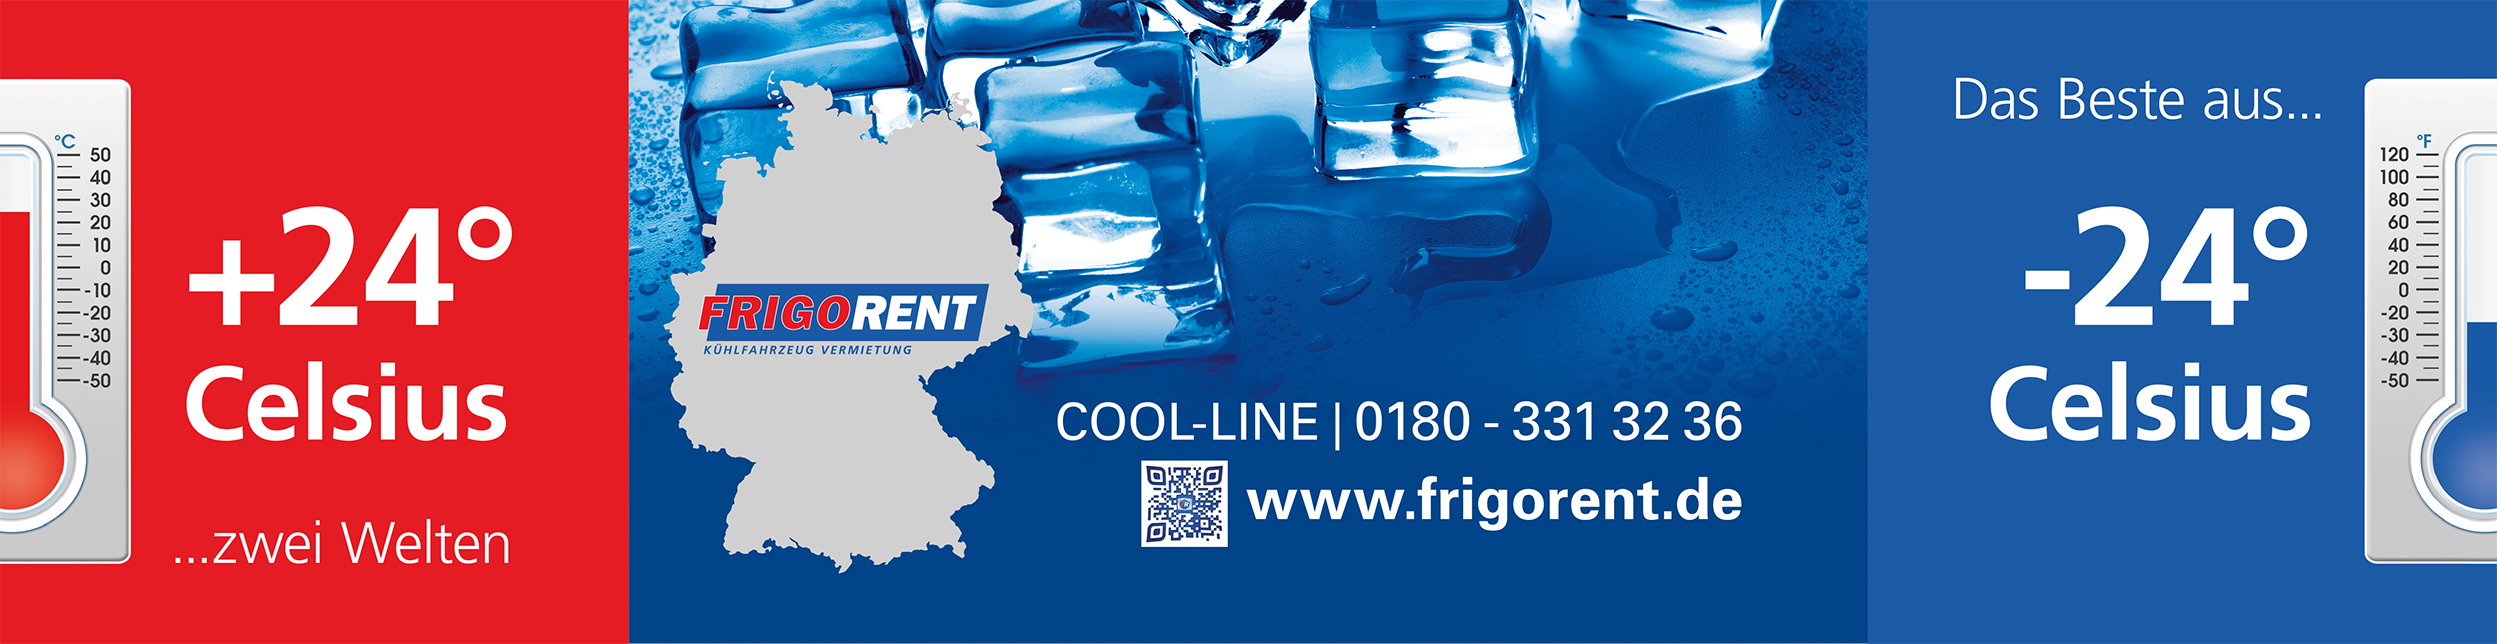 FrigoRent